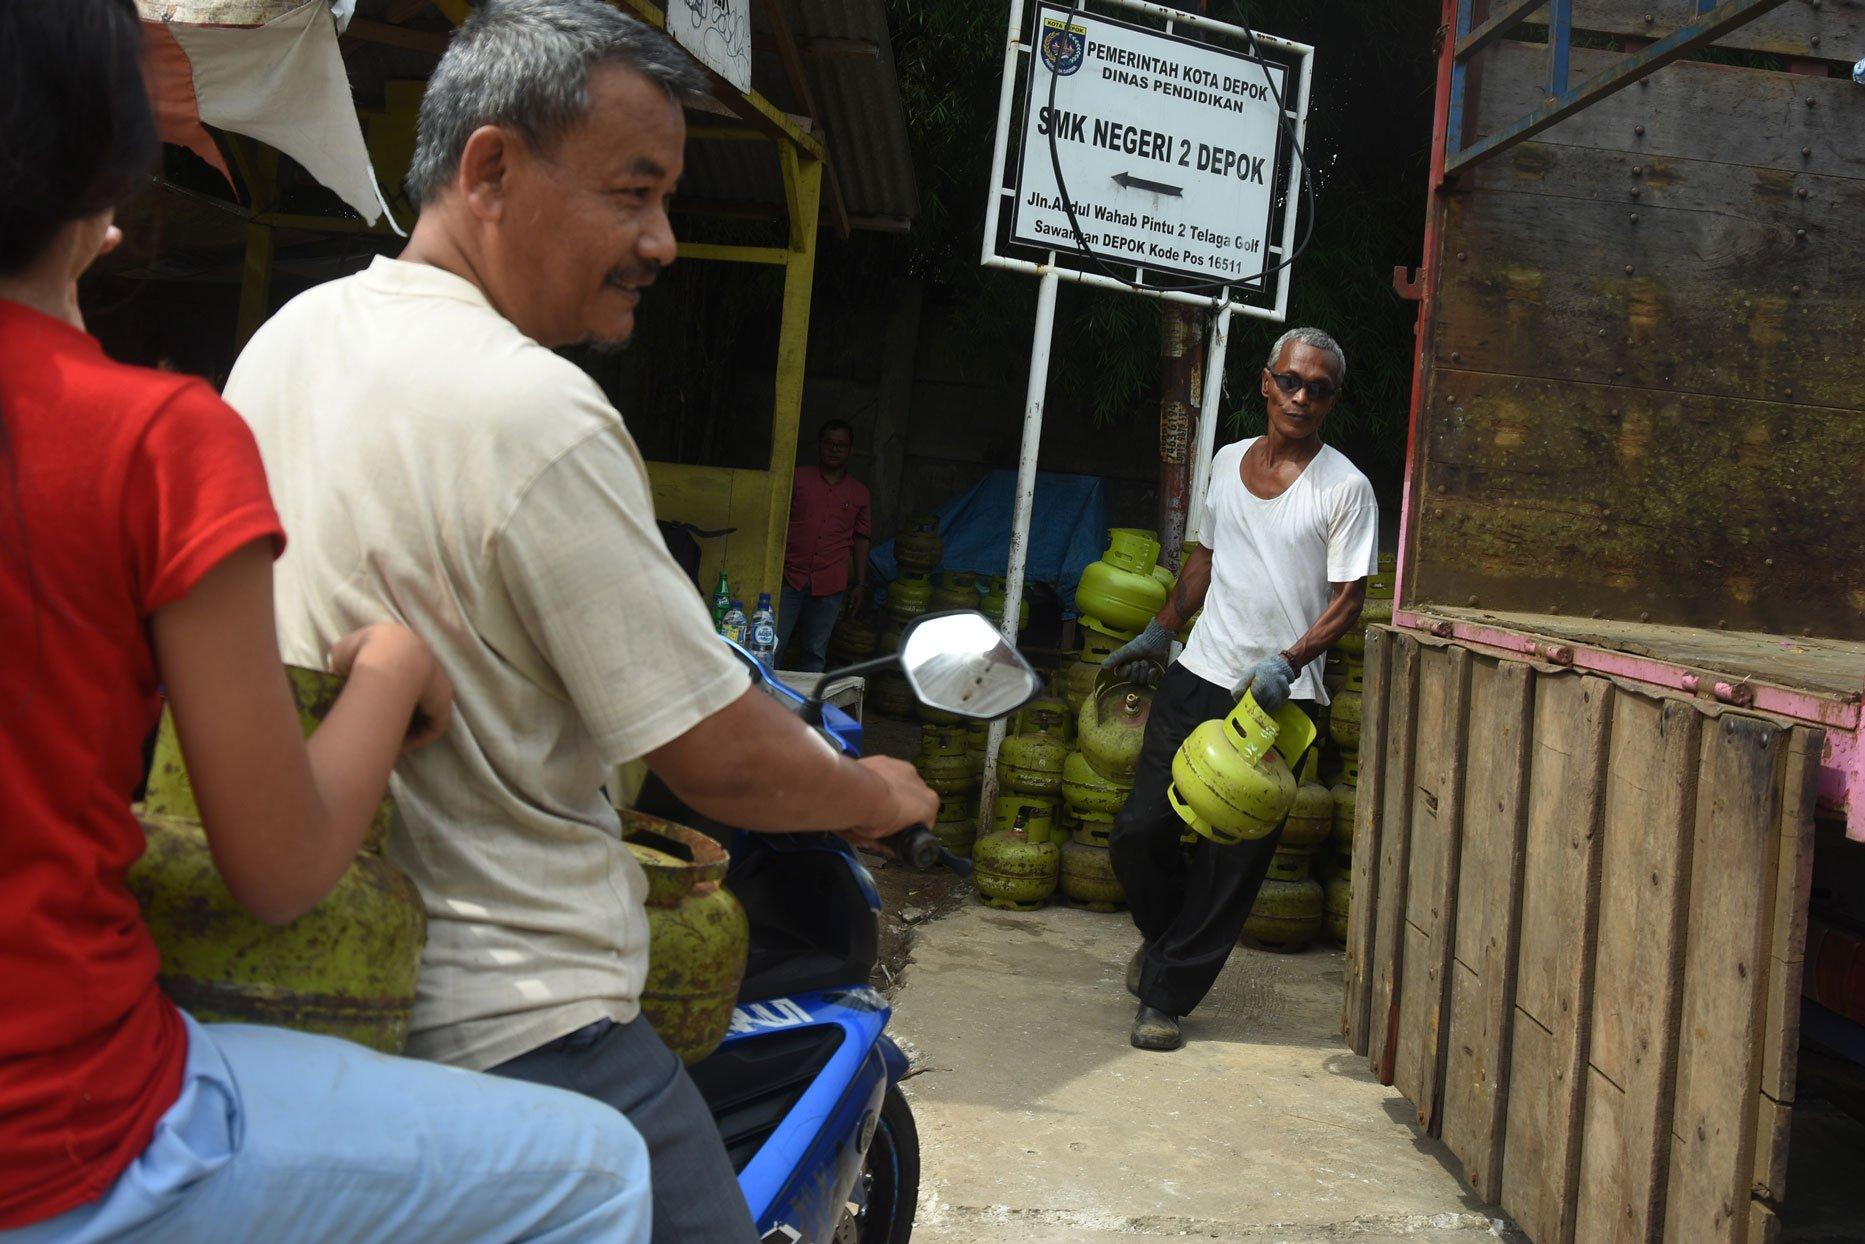 Warga Depok, Jawa Barat mengejar operasi pasar Selasa (5/12), untuk mendapatkan elpiji 3 kilogram sesuai Harga Eceran Tertinggi Rp 16.000.